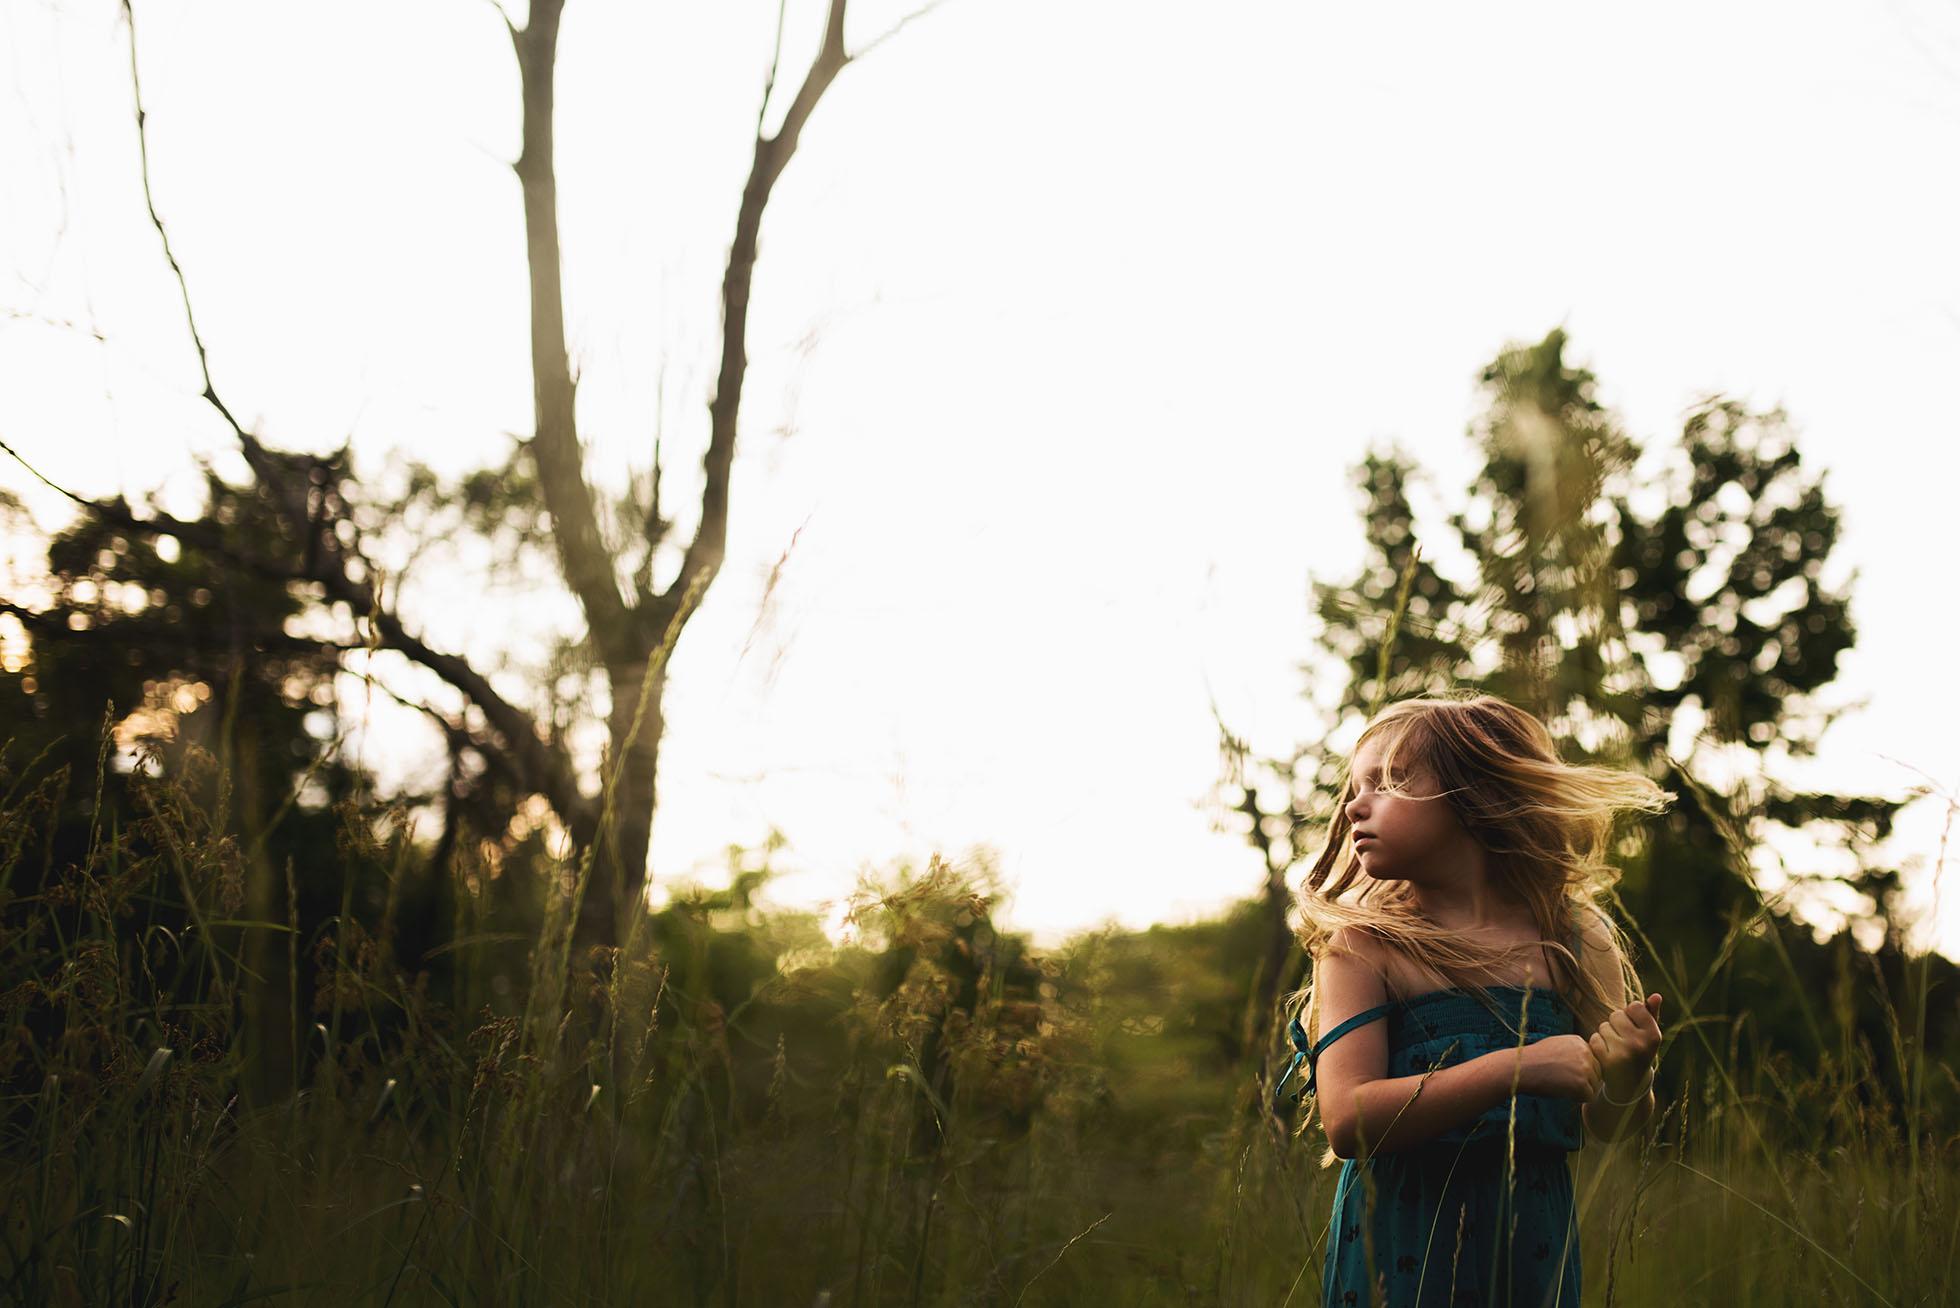 girl with hair blowing freezing motion kellie bieser